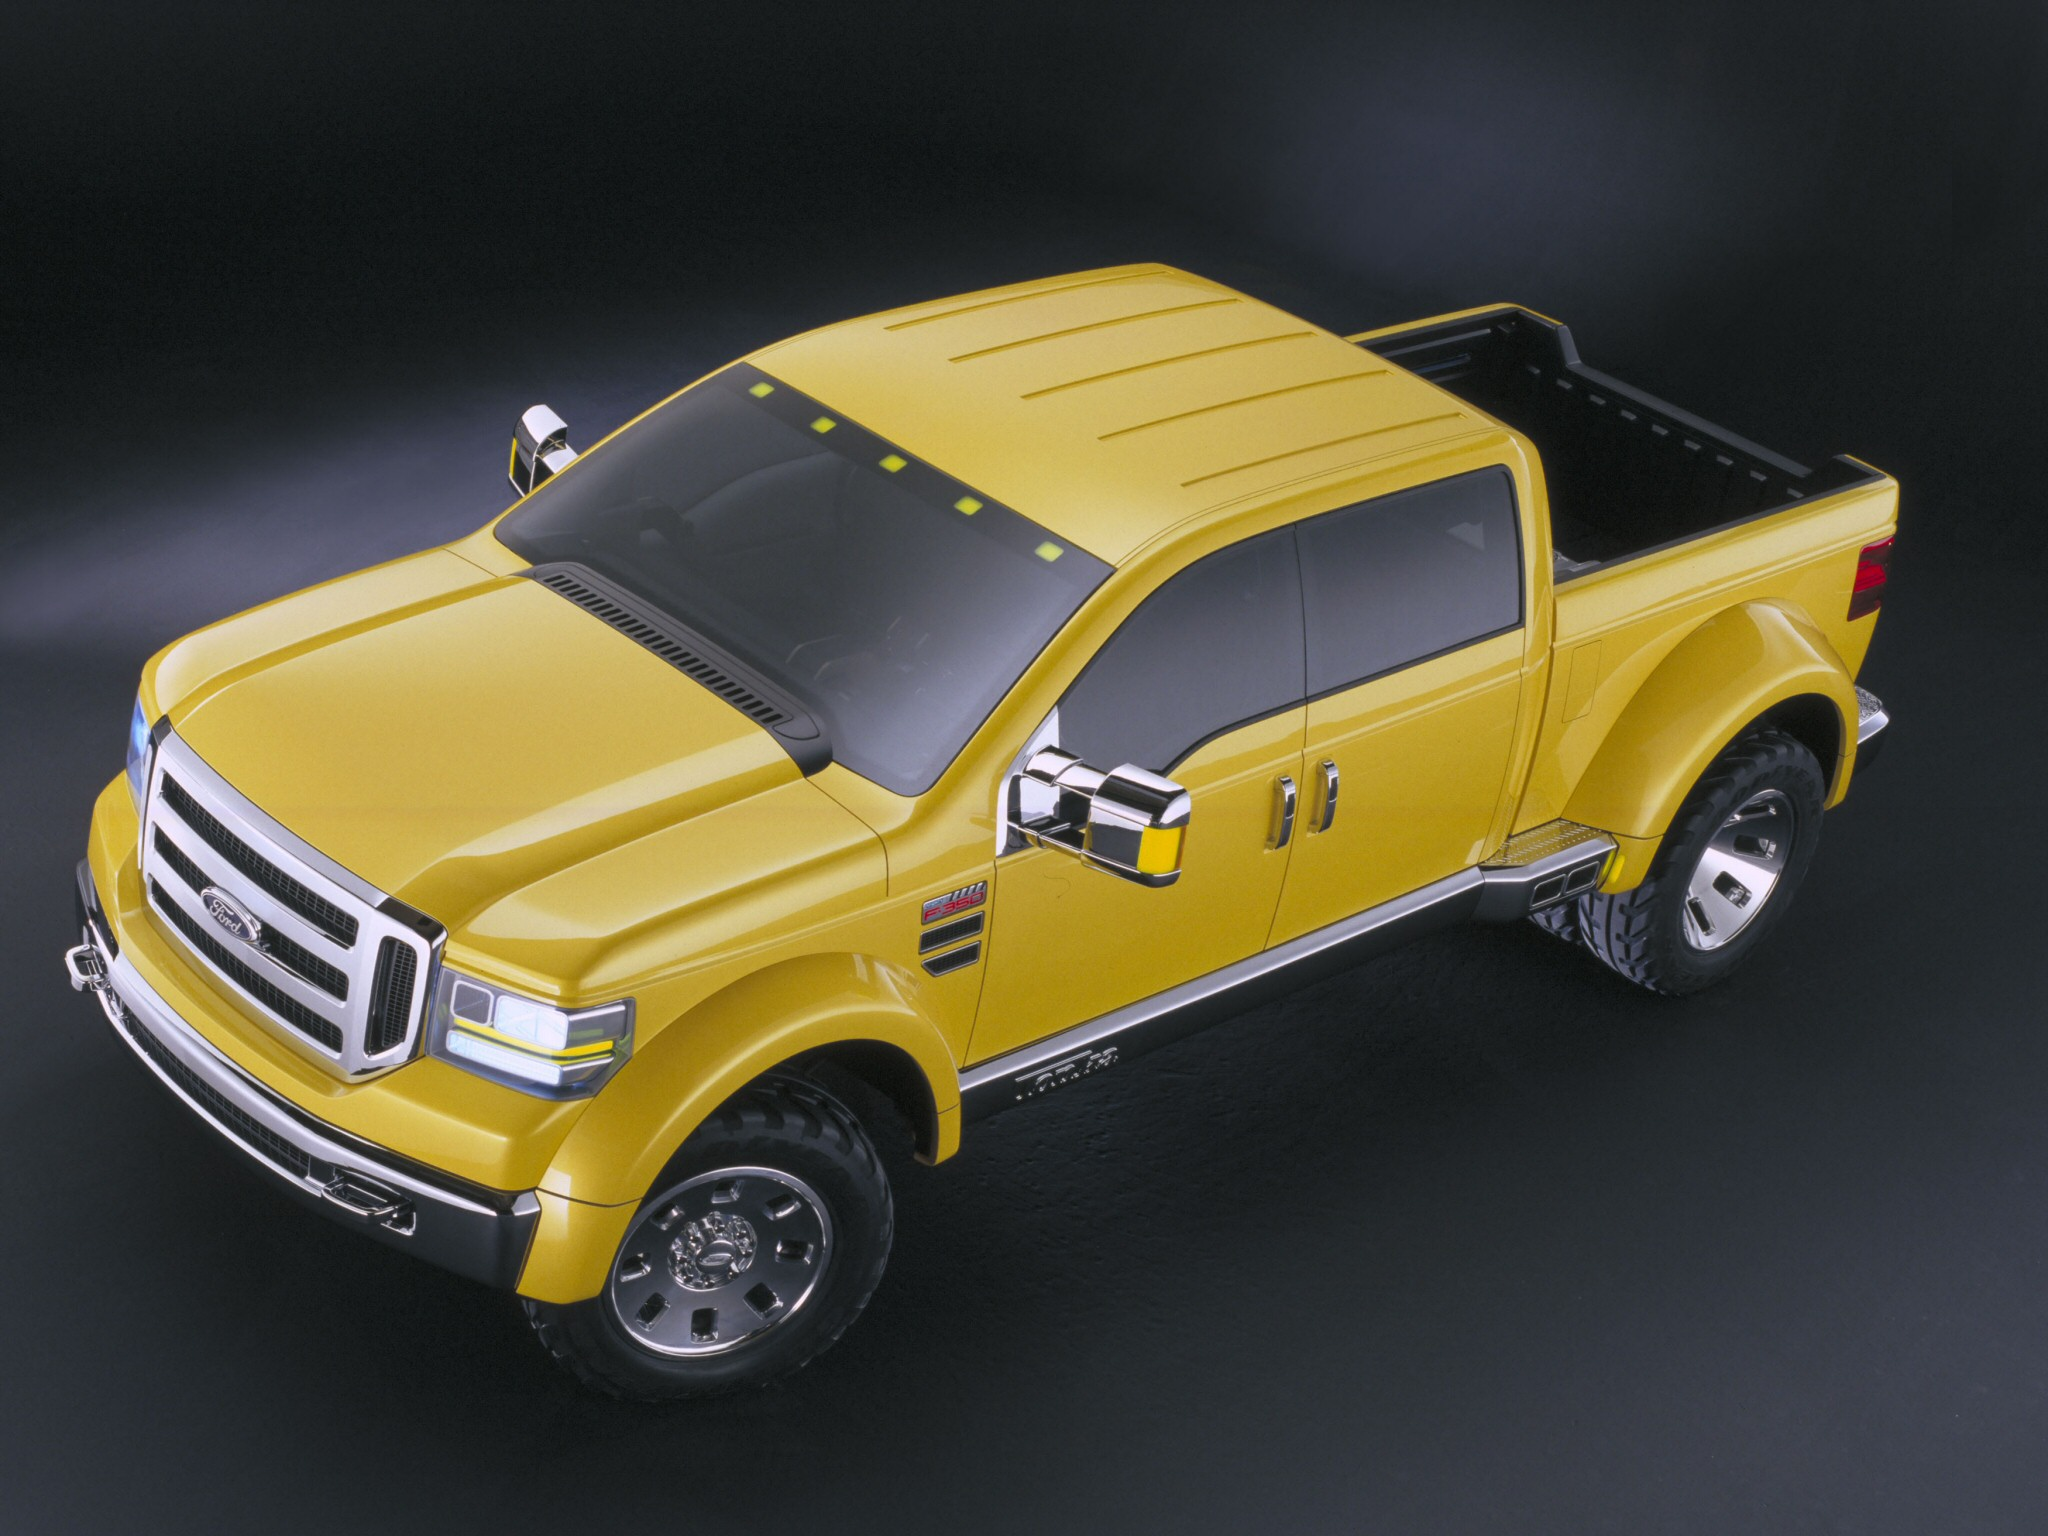 2002 ford f 350 tonka concept mighty truck 4x4 custom f wallpaper - Mighty Ford F 750 Tonka